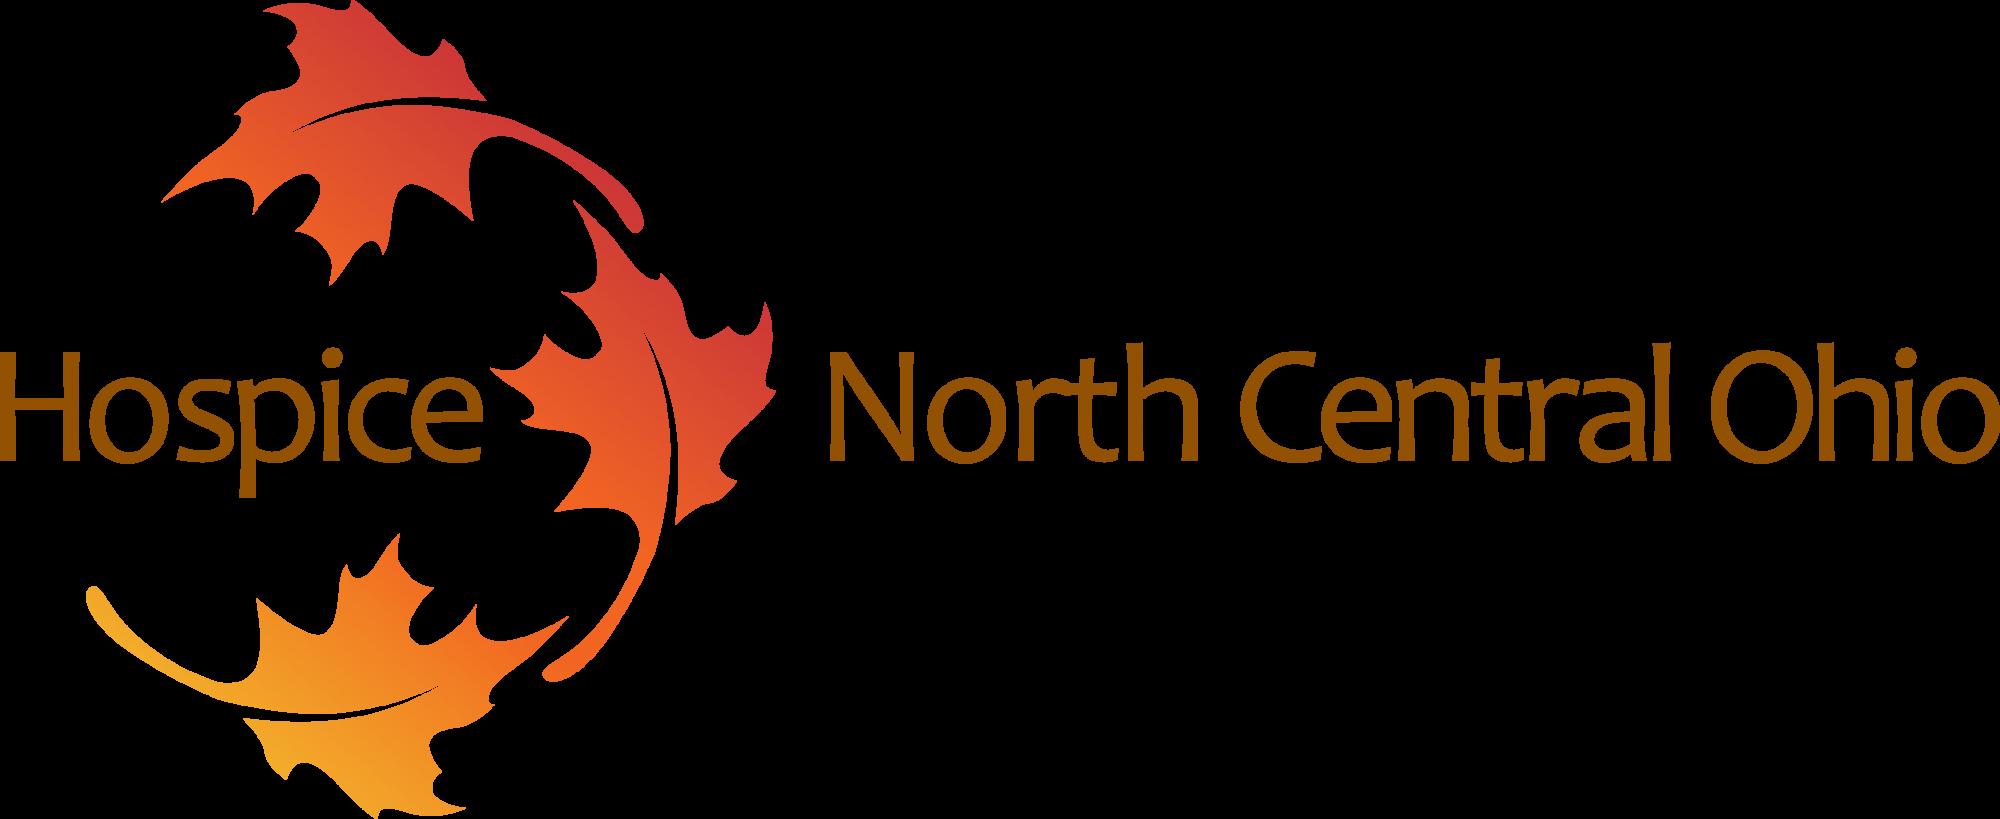 Hnco logo